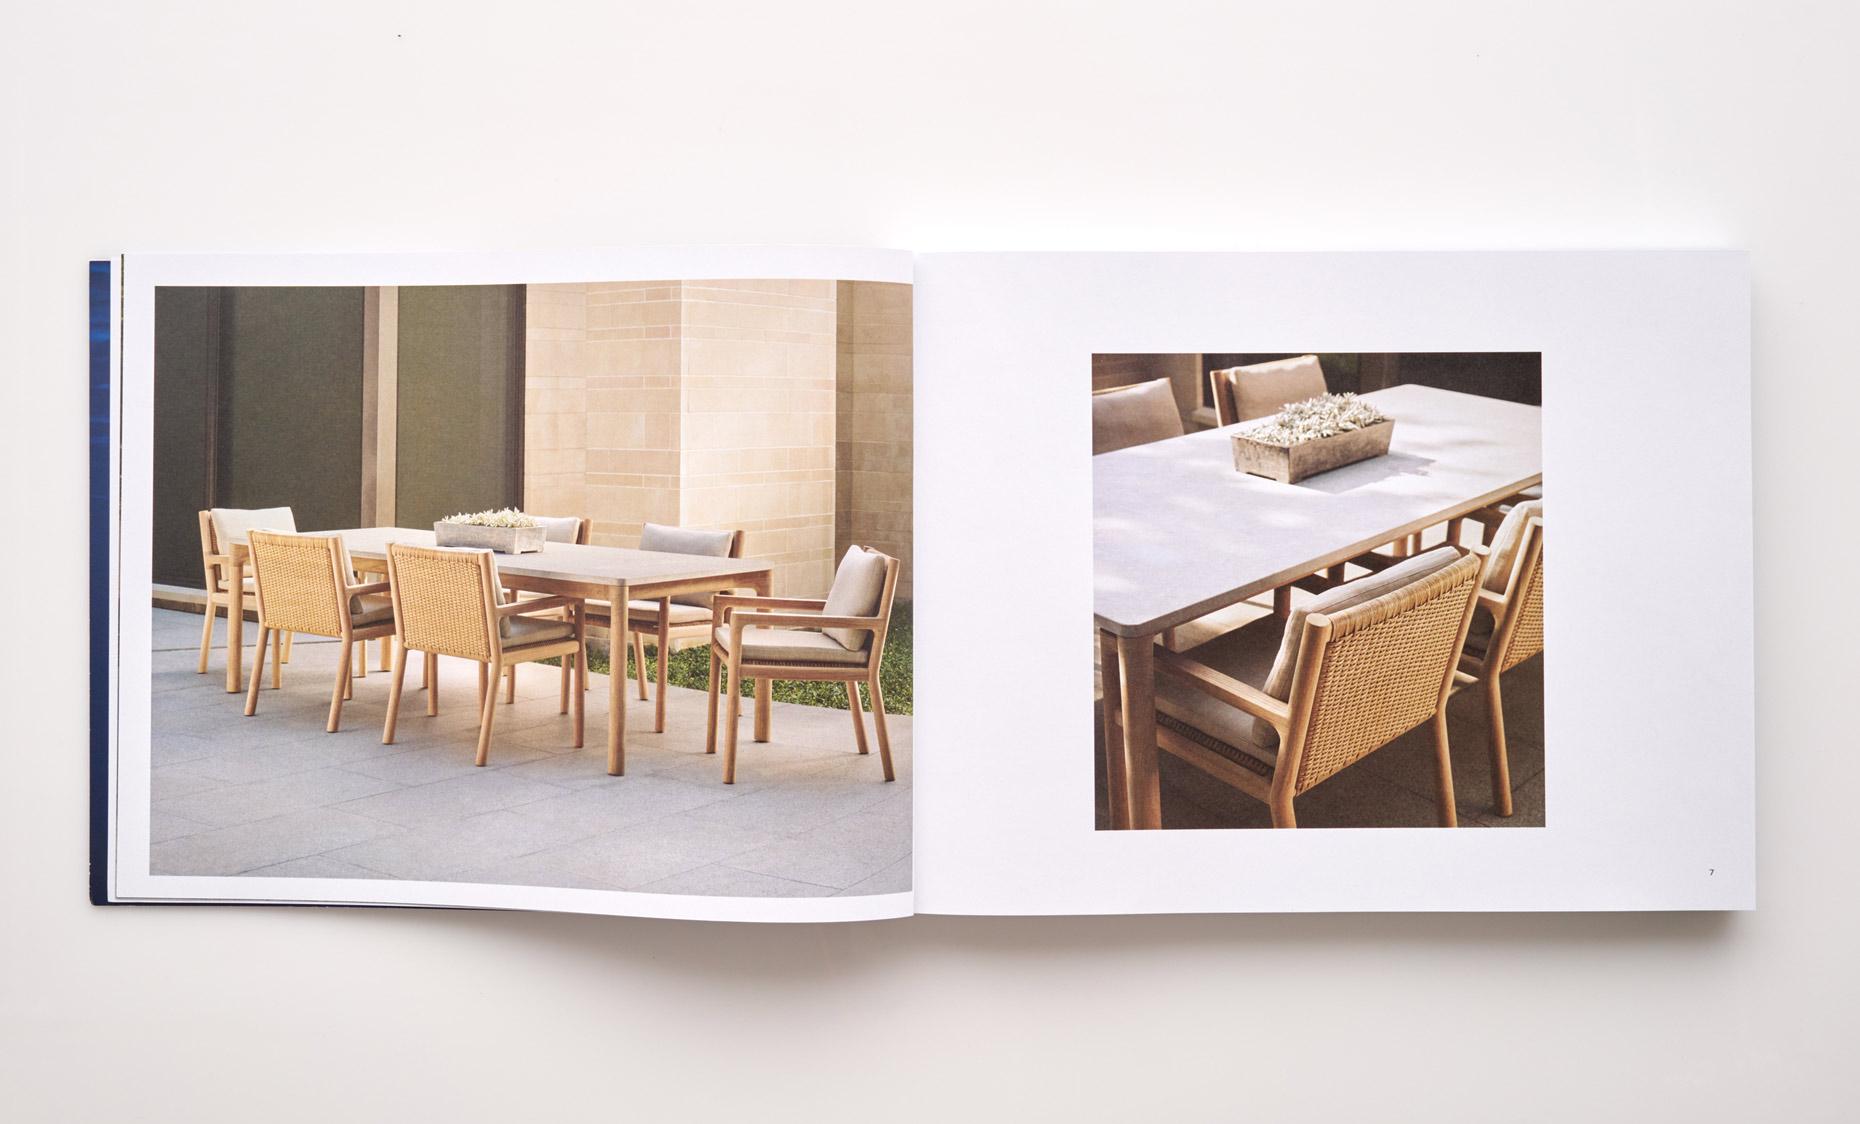 Stephen Karlisch Sutherland Furniture Franck Dining